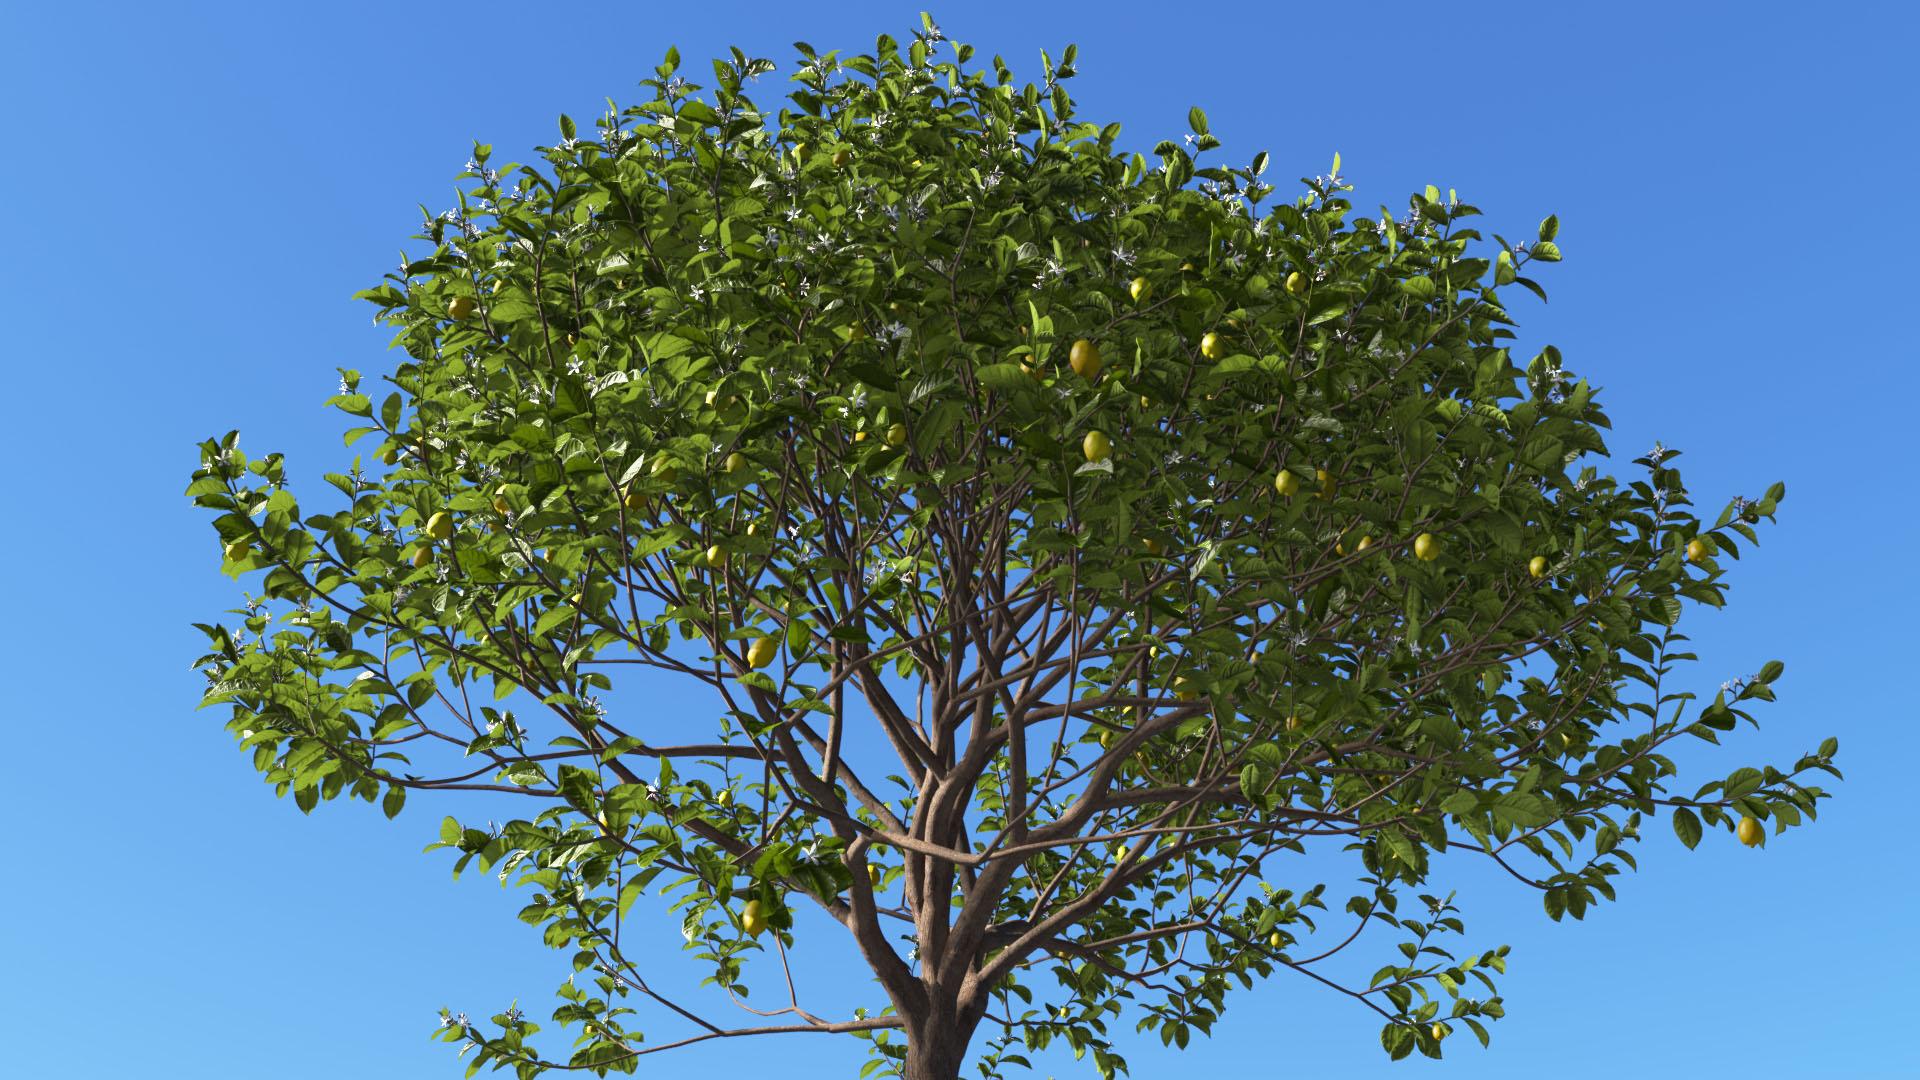 3D model of the Lemon tree Citrus x limon close-up